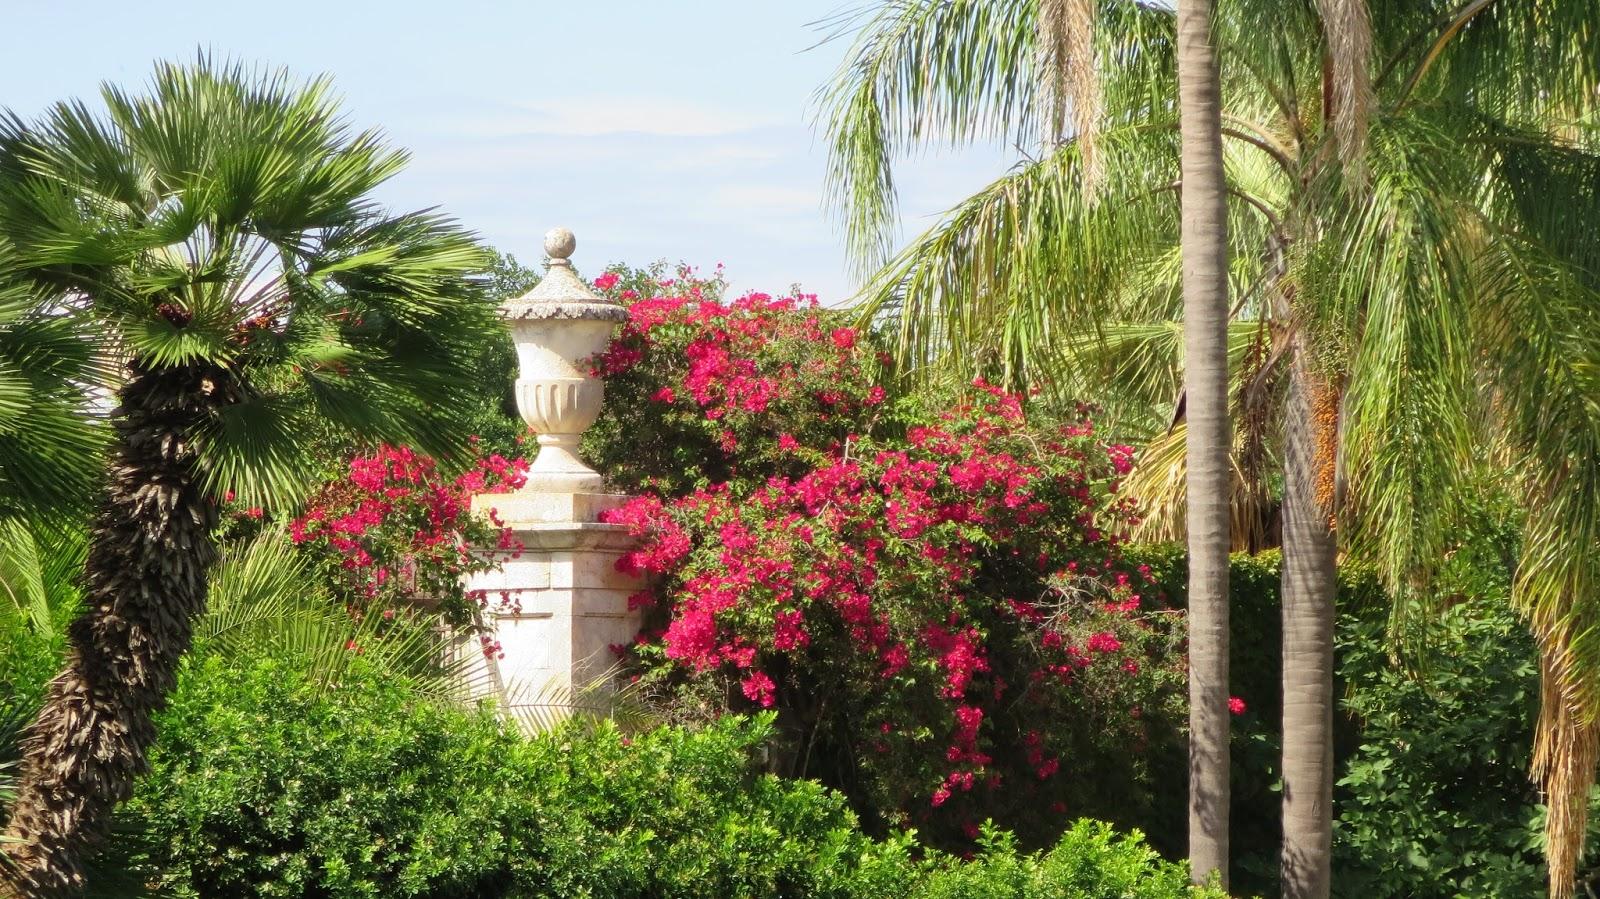 hortibus voyage palais et jardins prives de sicile avec les jardins du gers. Black Bedroom Furniture Sets. Home Design Ideas